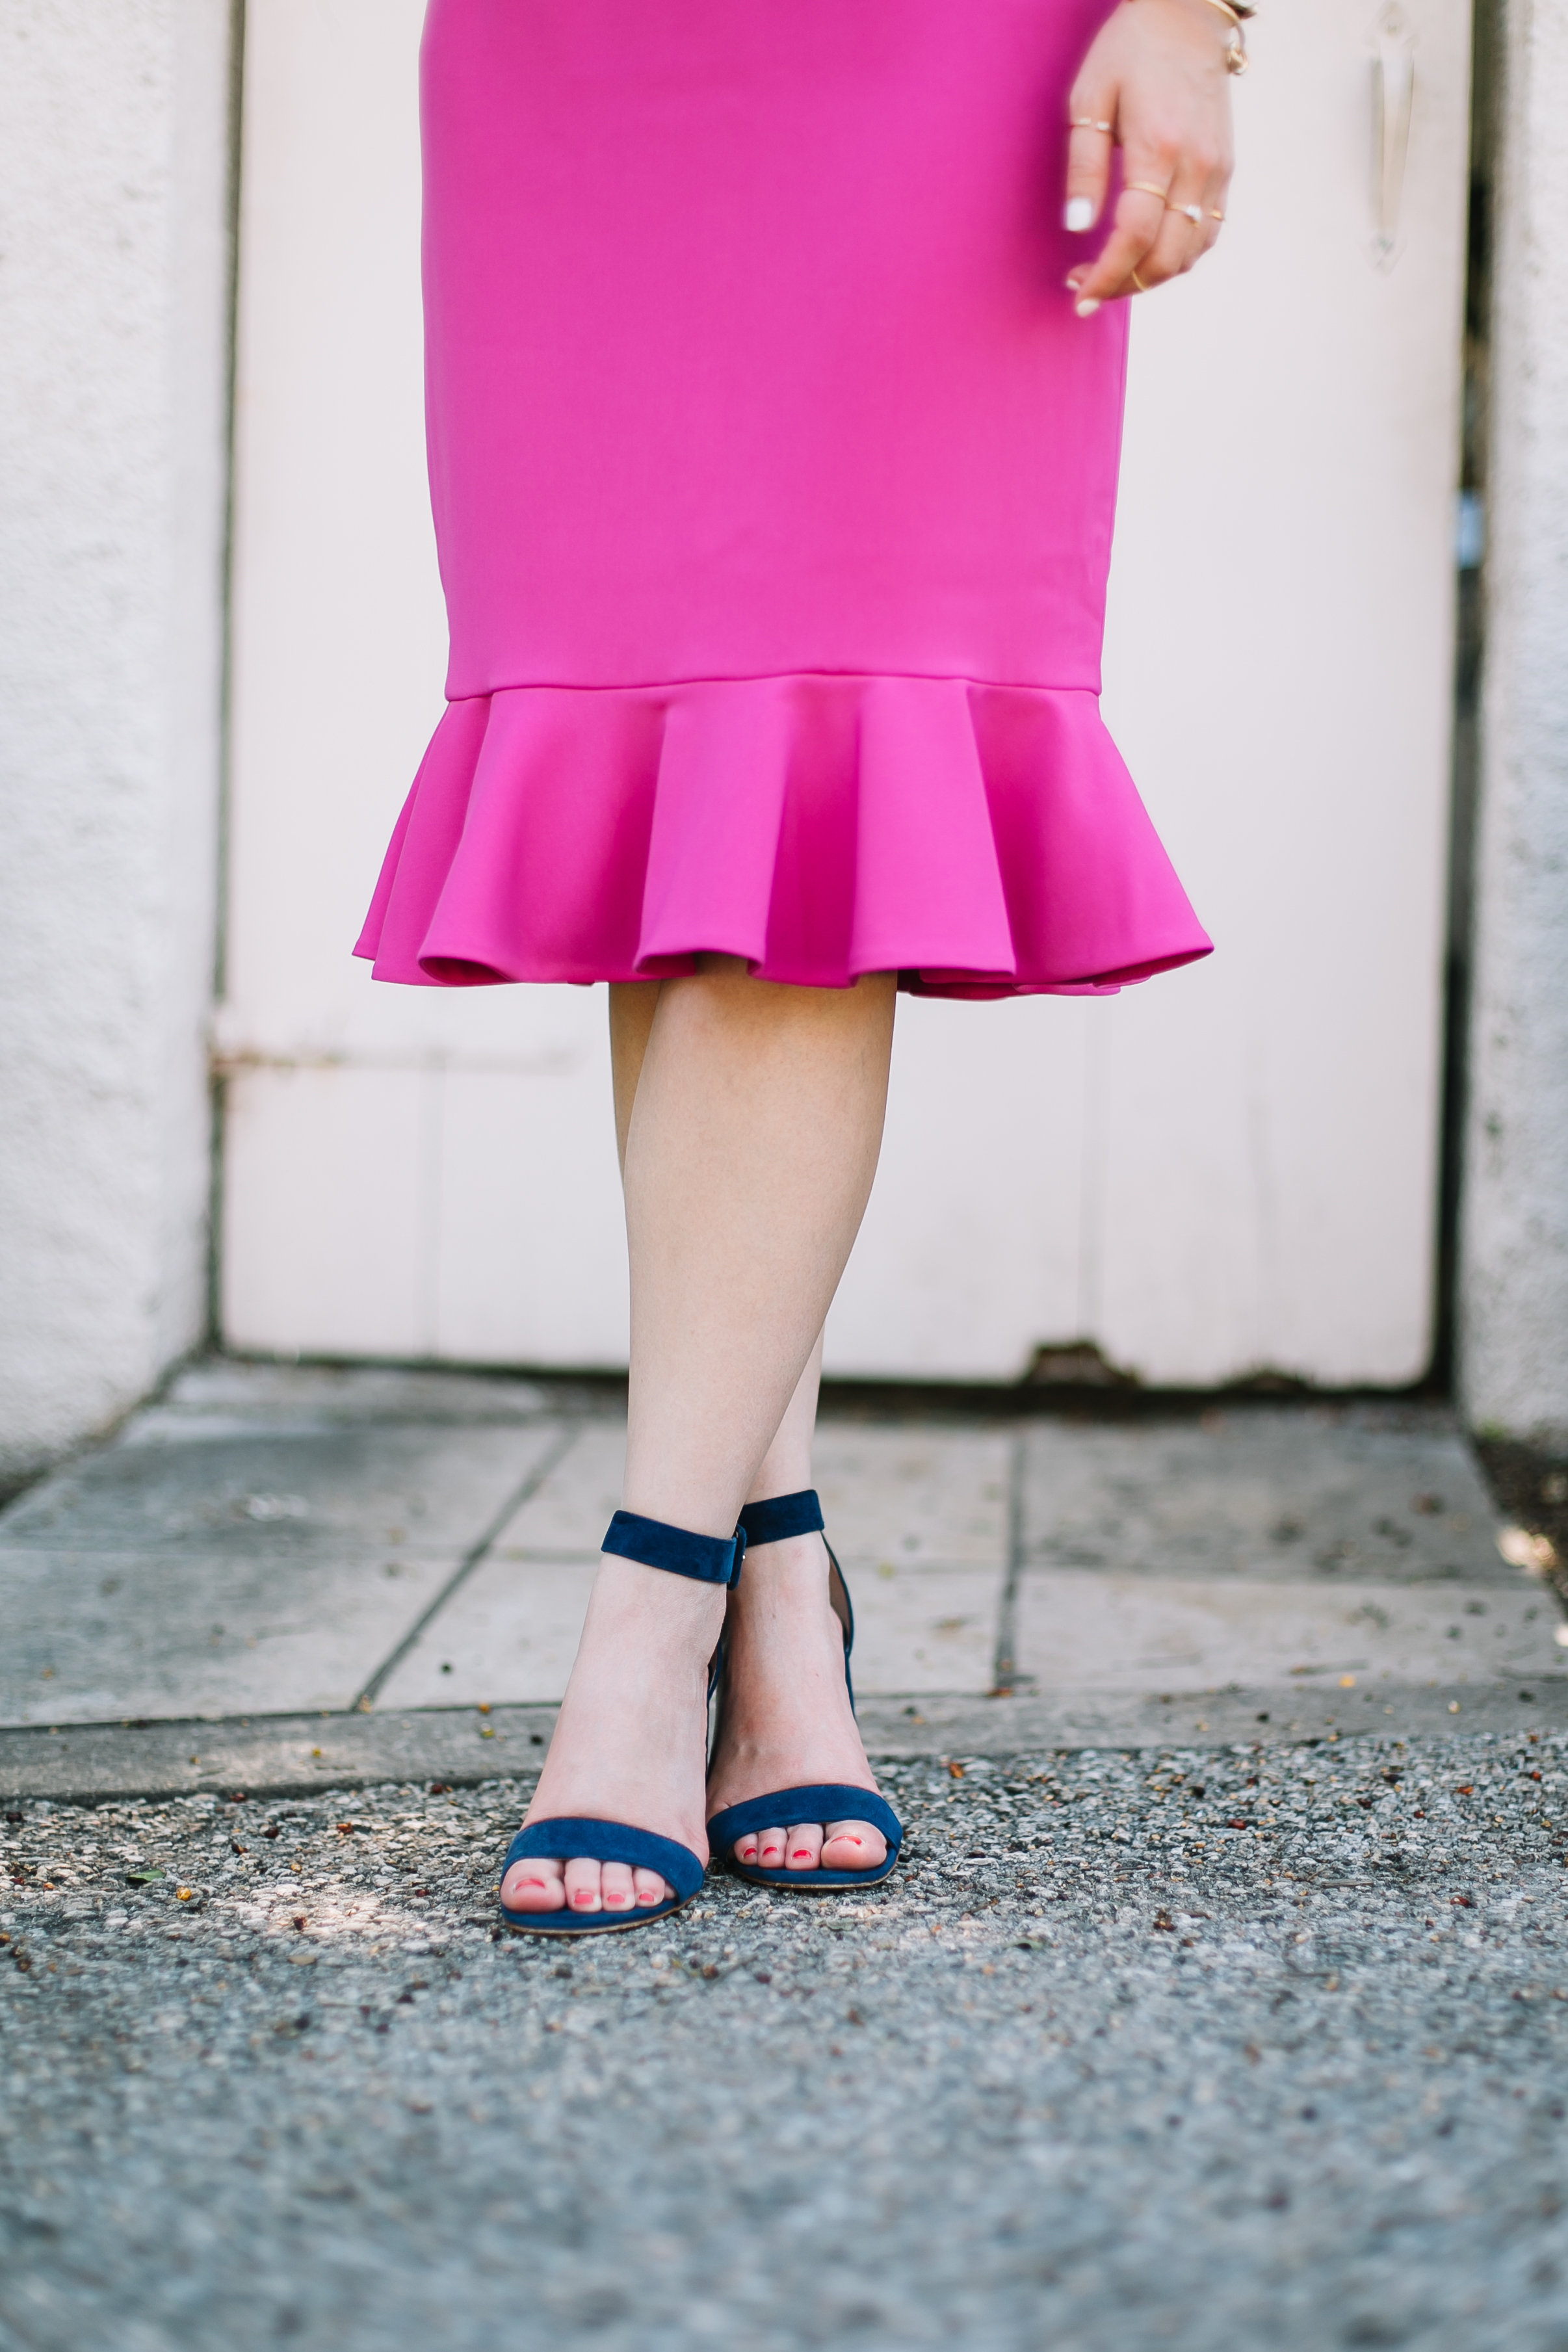 timeless dresses by camilyn beth -- jannadoan.com